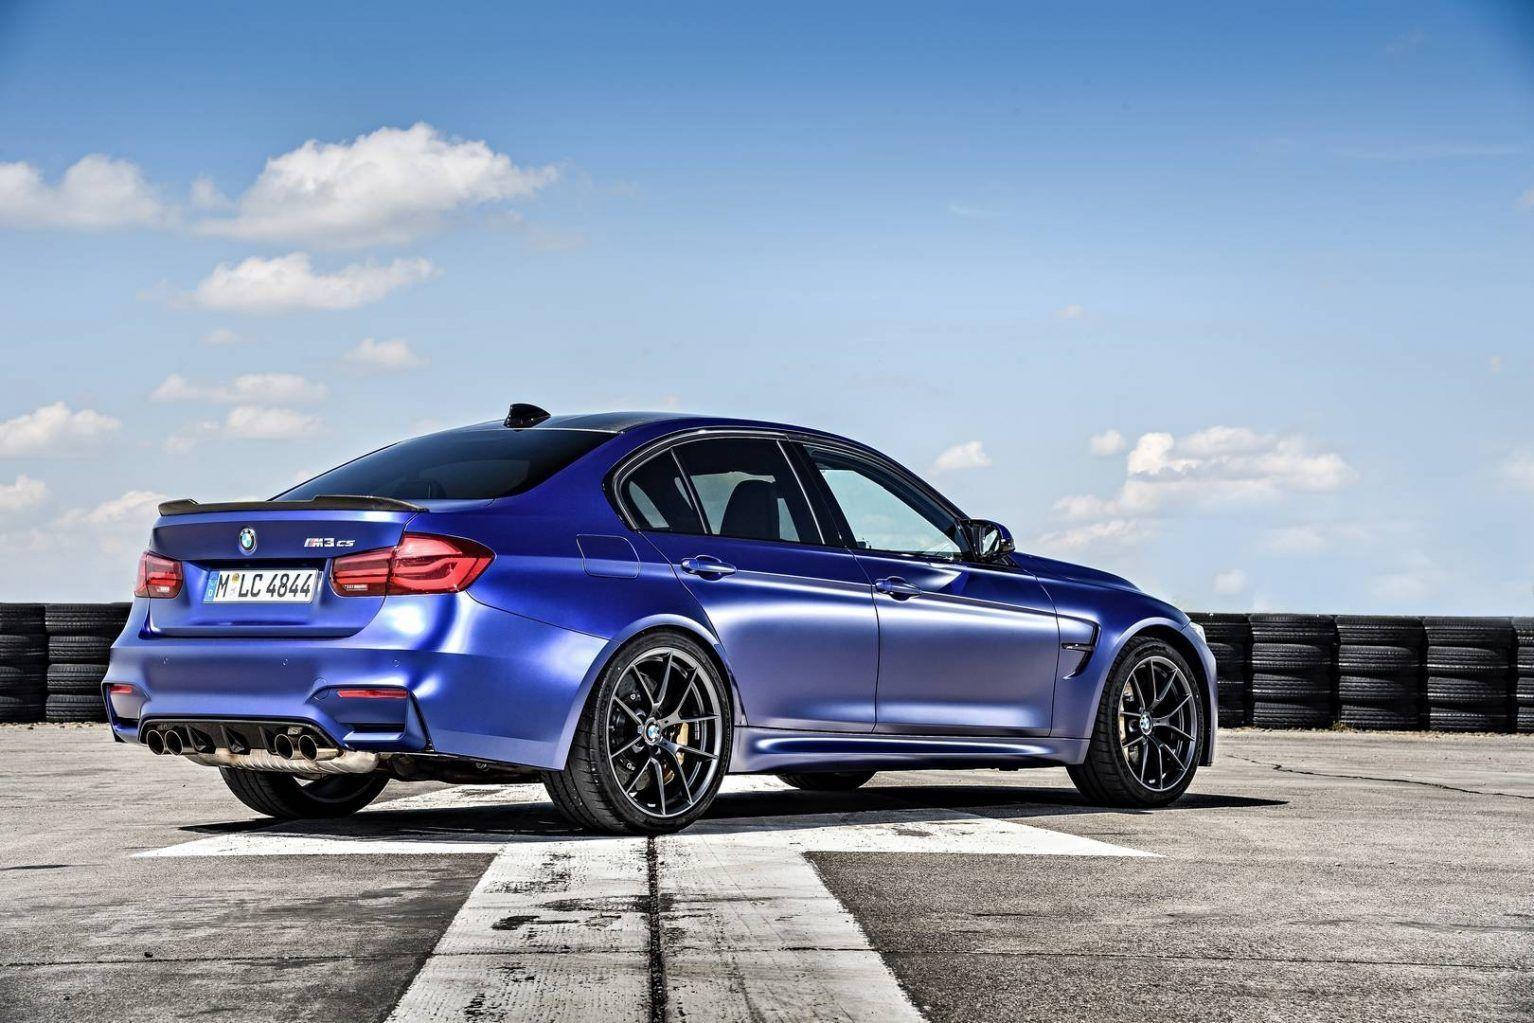 Best Bmw M3 2019 New Concept Bmw Bmw M3 M3 Sedan